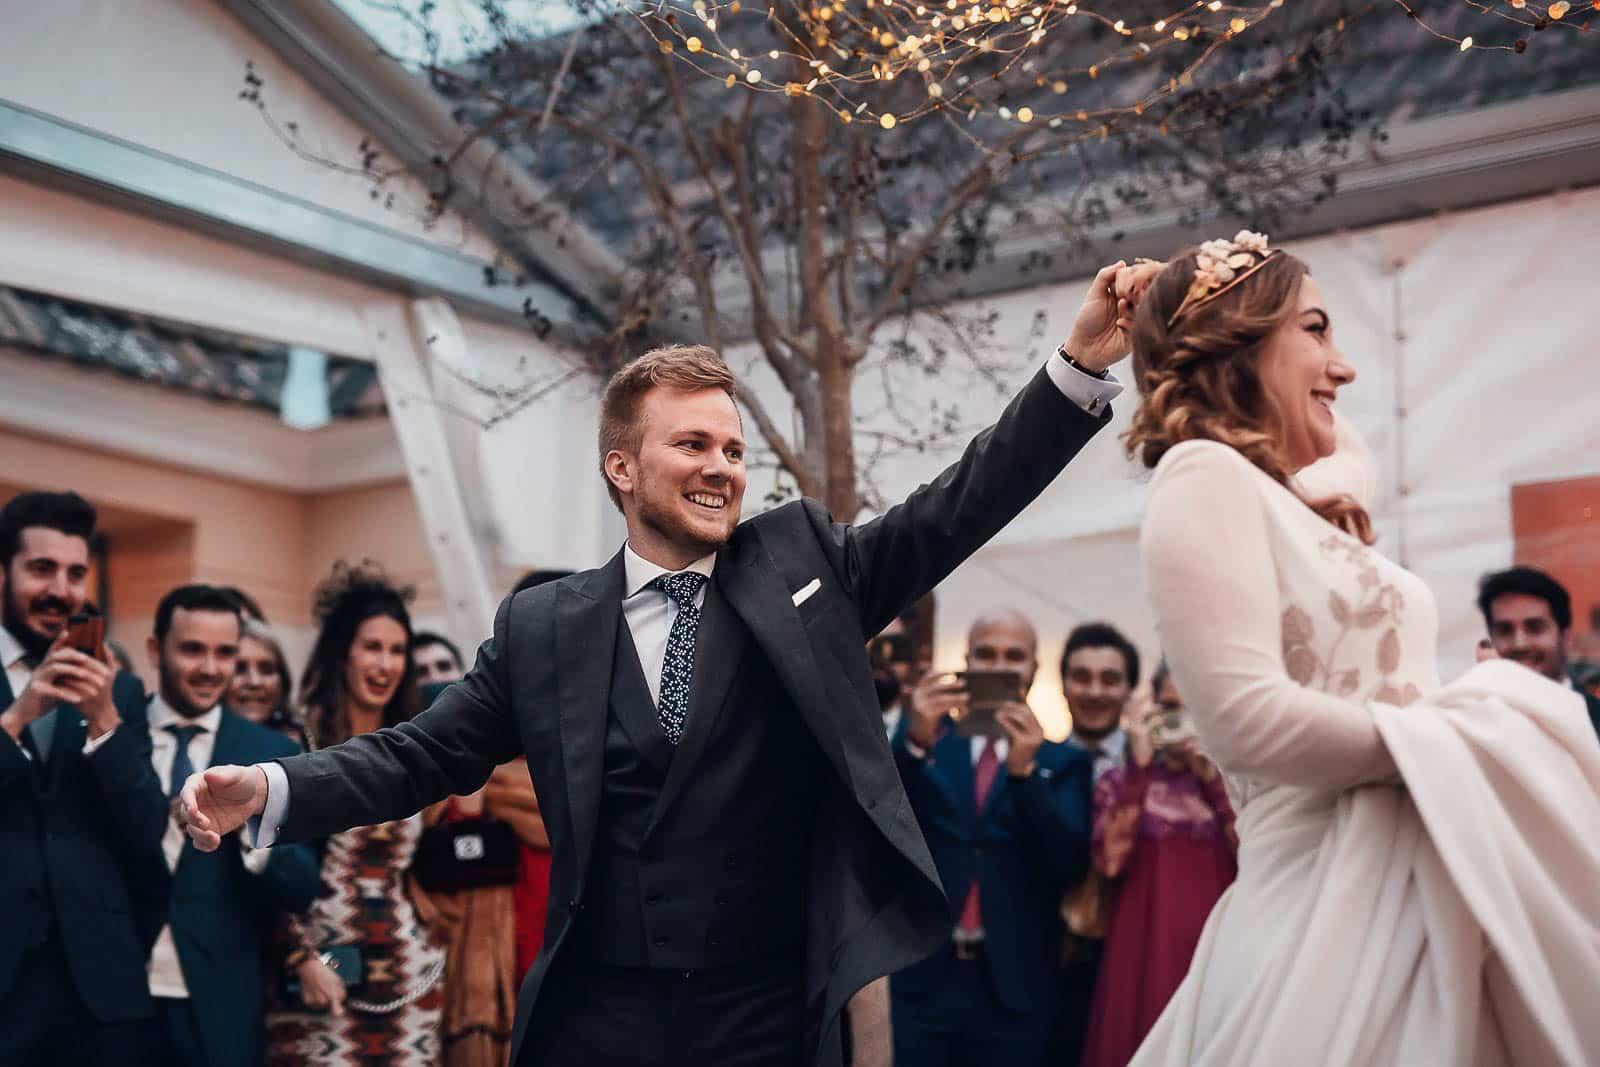 baile nupcial boda novios pareja vuelta